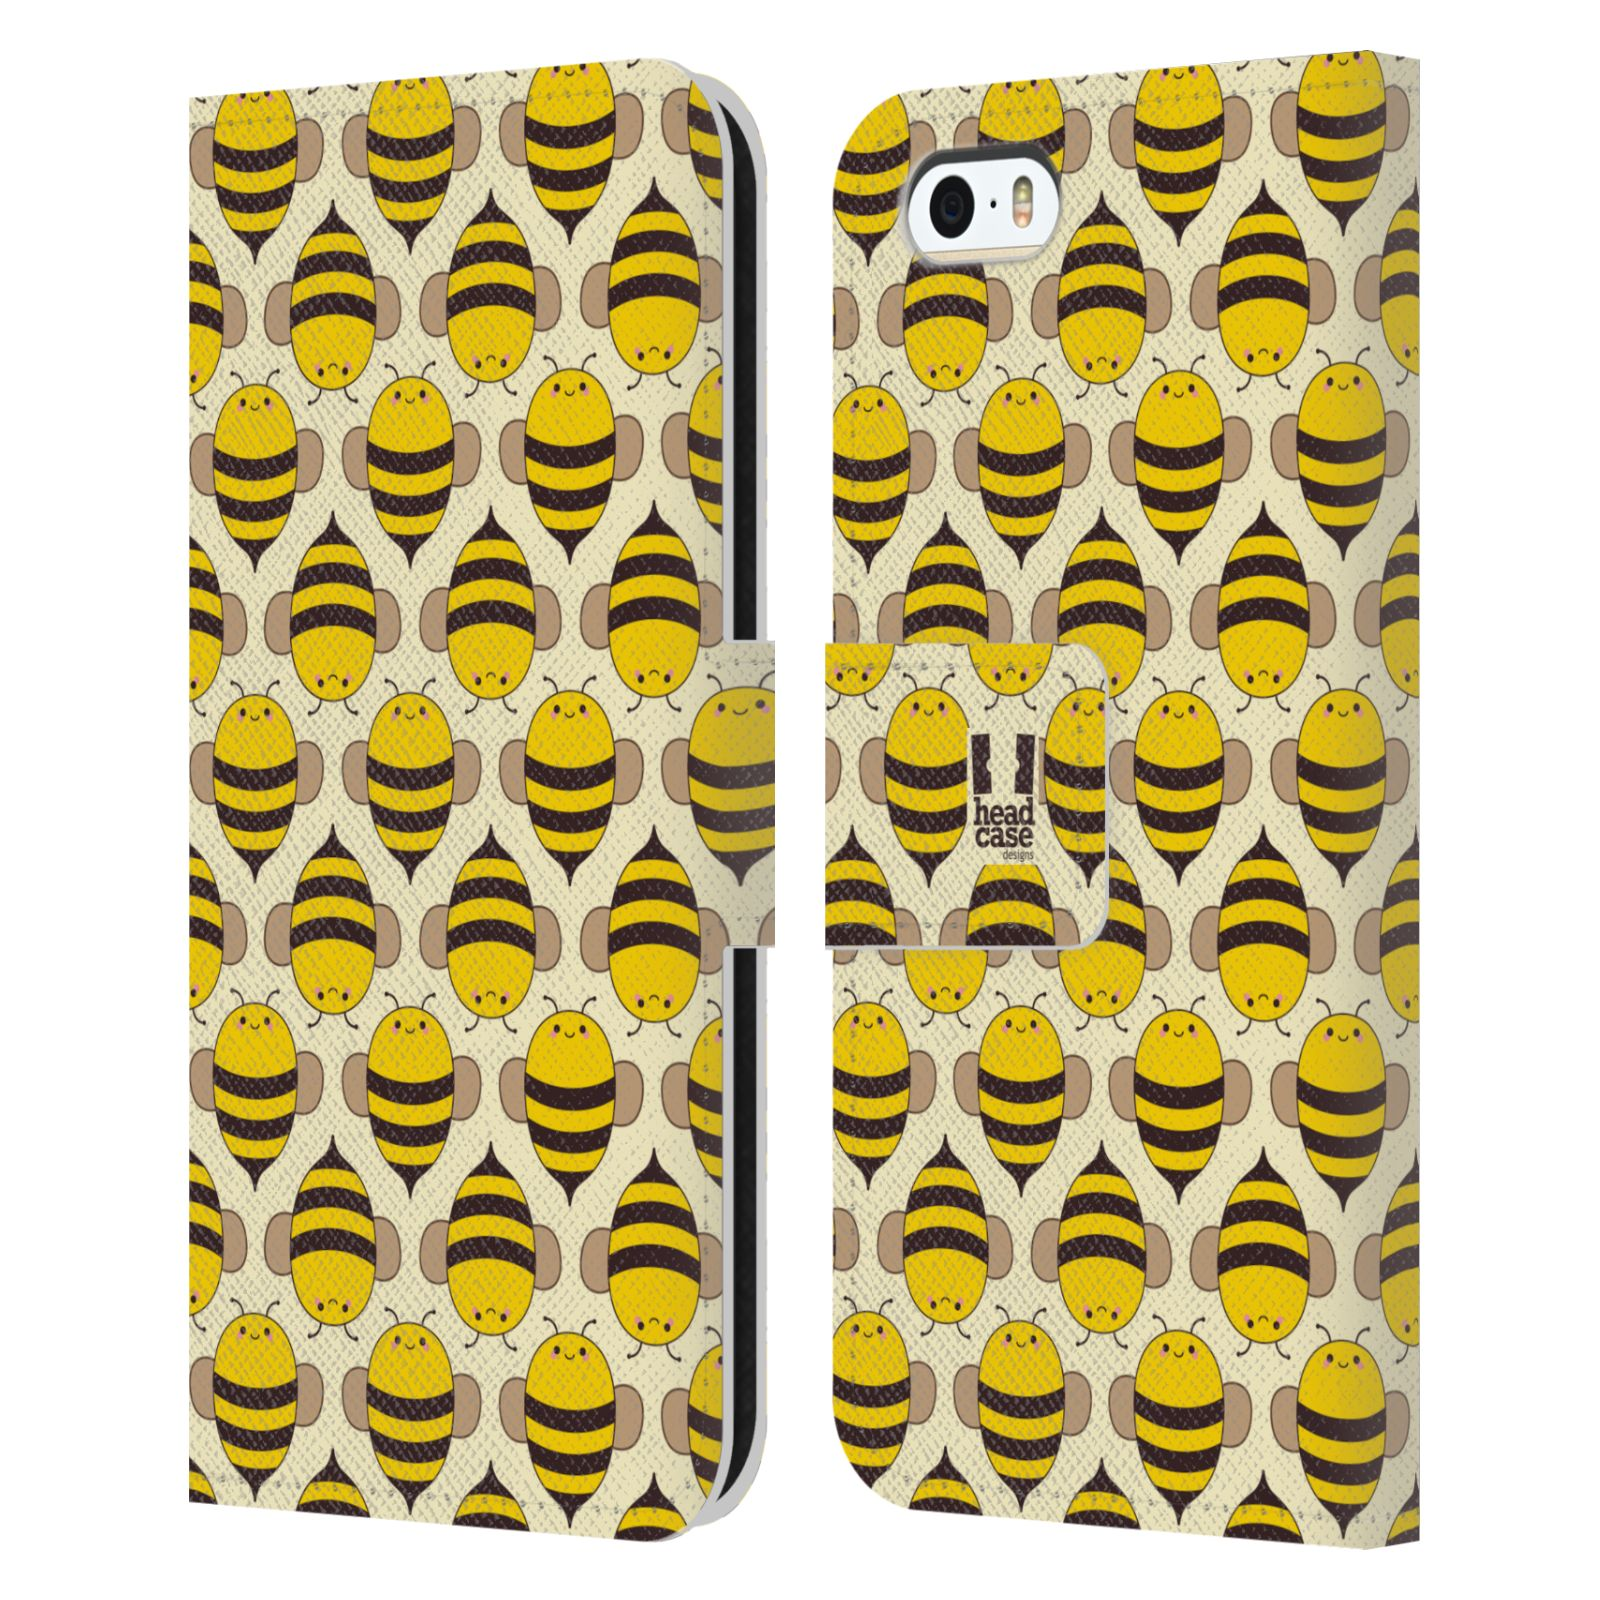 HEAD CASE Flipové pouzdro pro mobil Apple Iphone 5/5s VČELÍ VZOR kolonie včelek